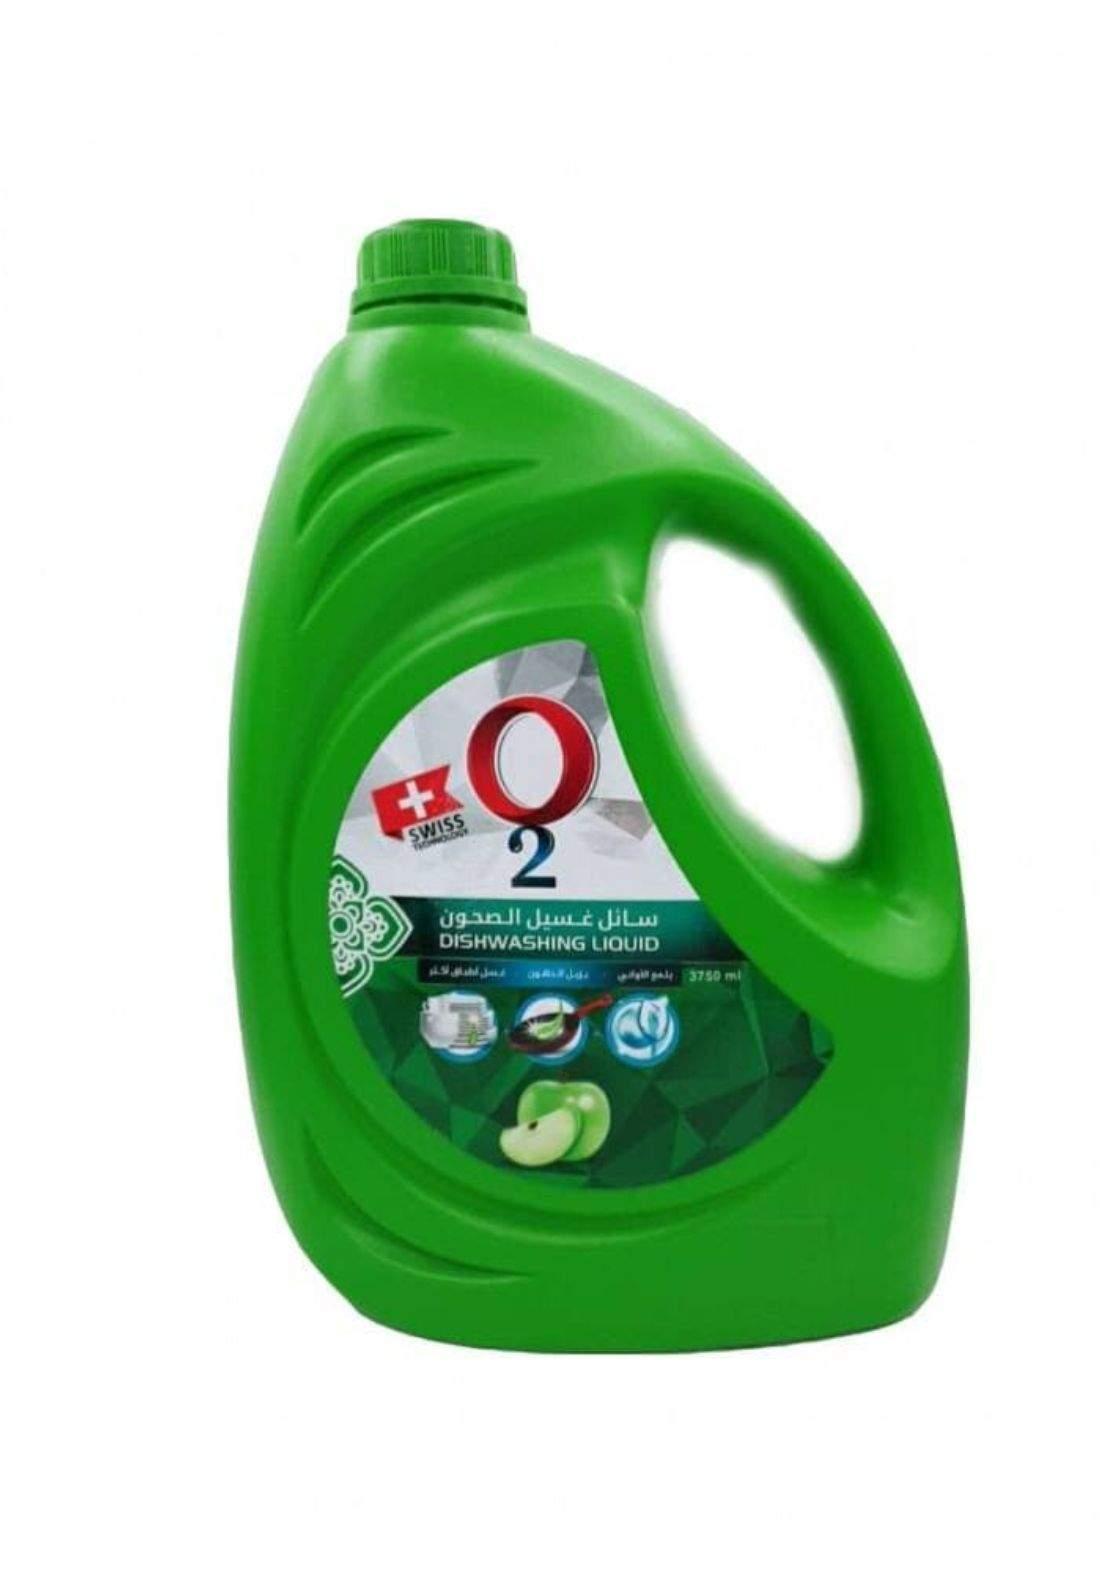 O2 Dishwashing liquid3750mlاوتو  سائل التنظيف الاواني